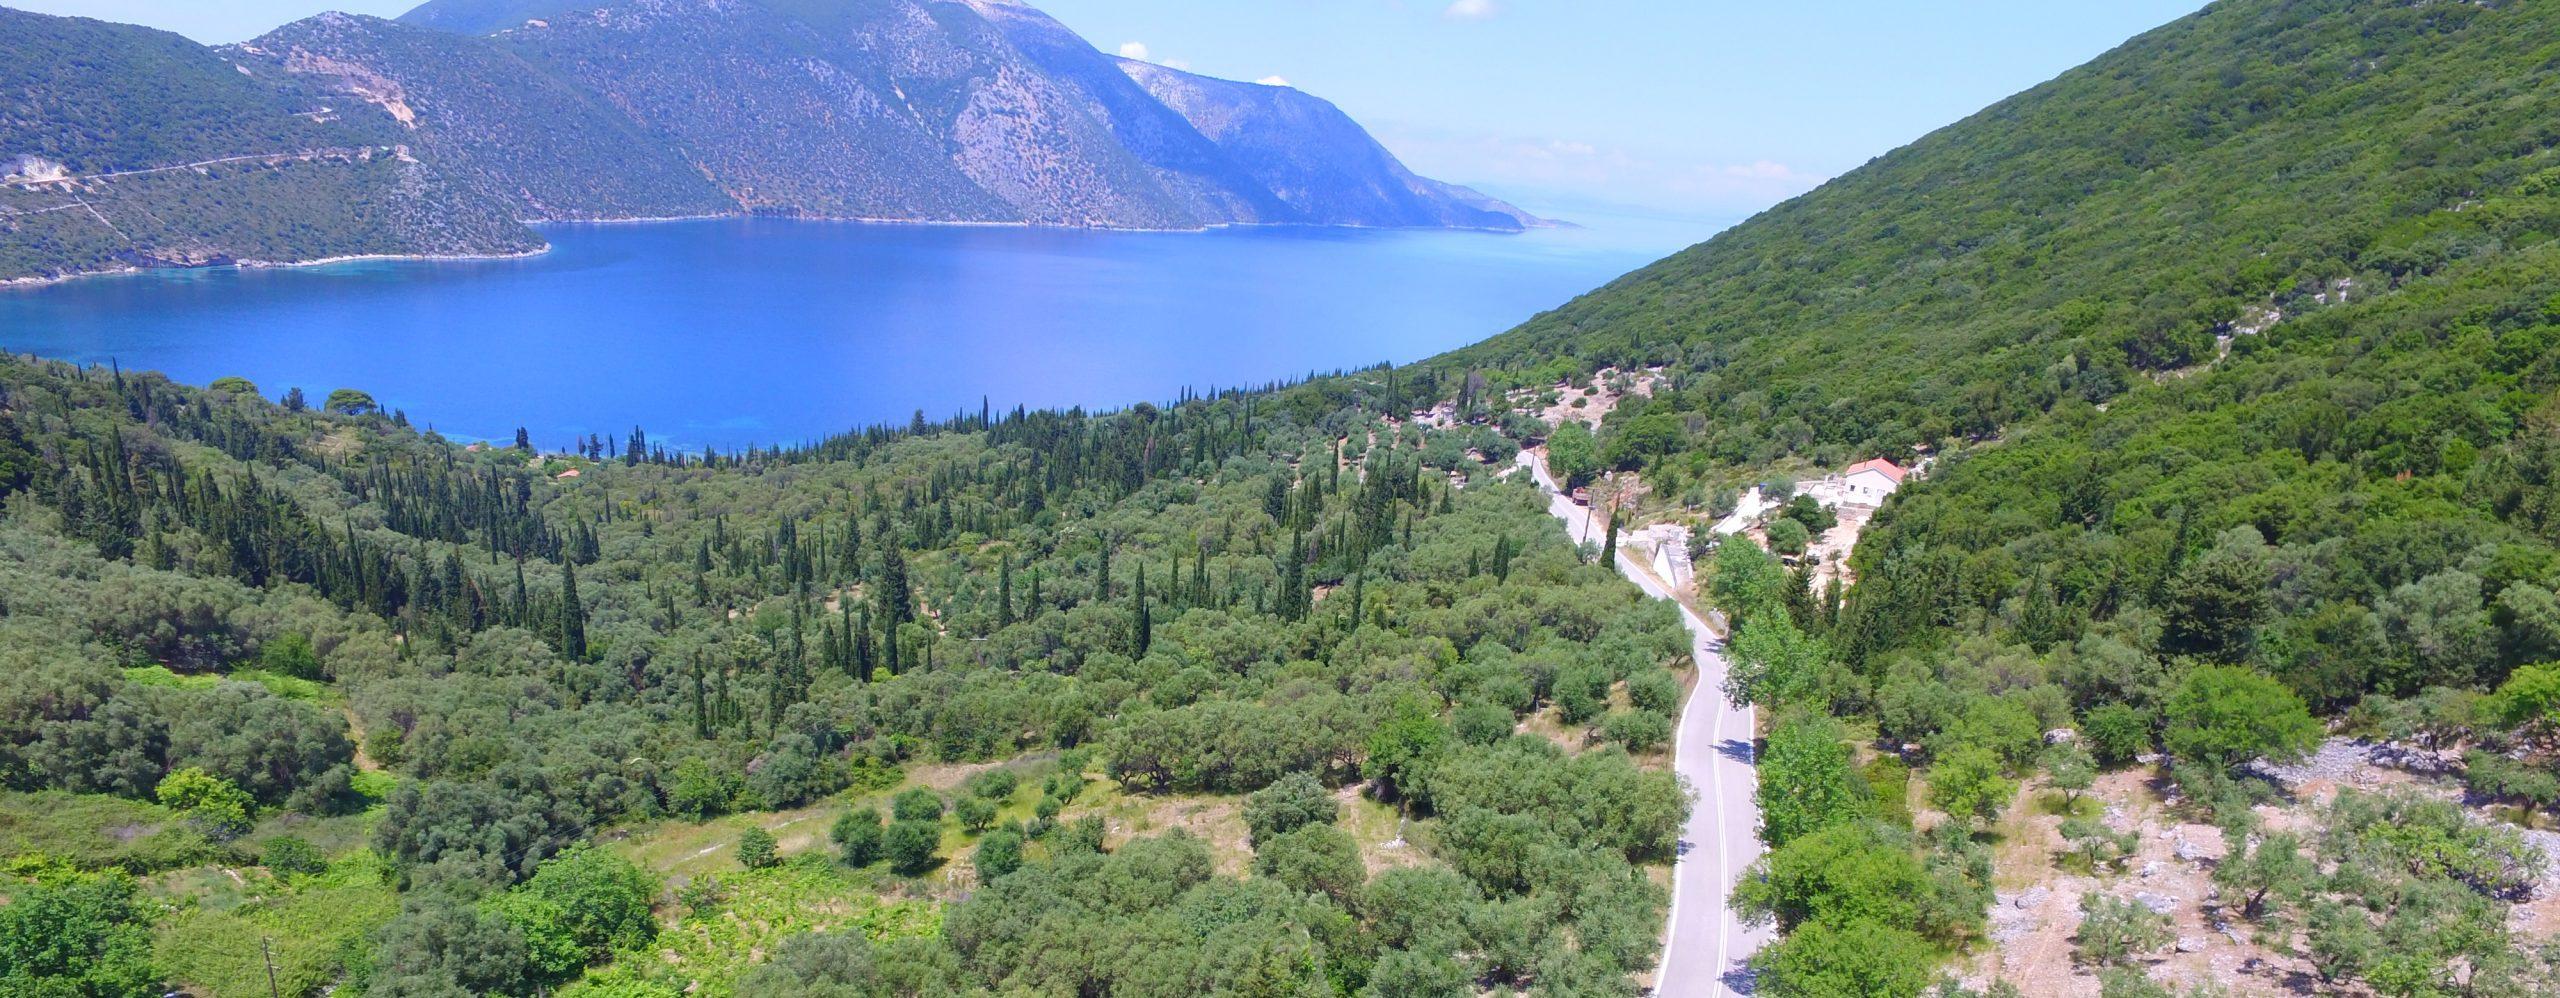 MV Properties real estate Ithaca greece